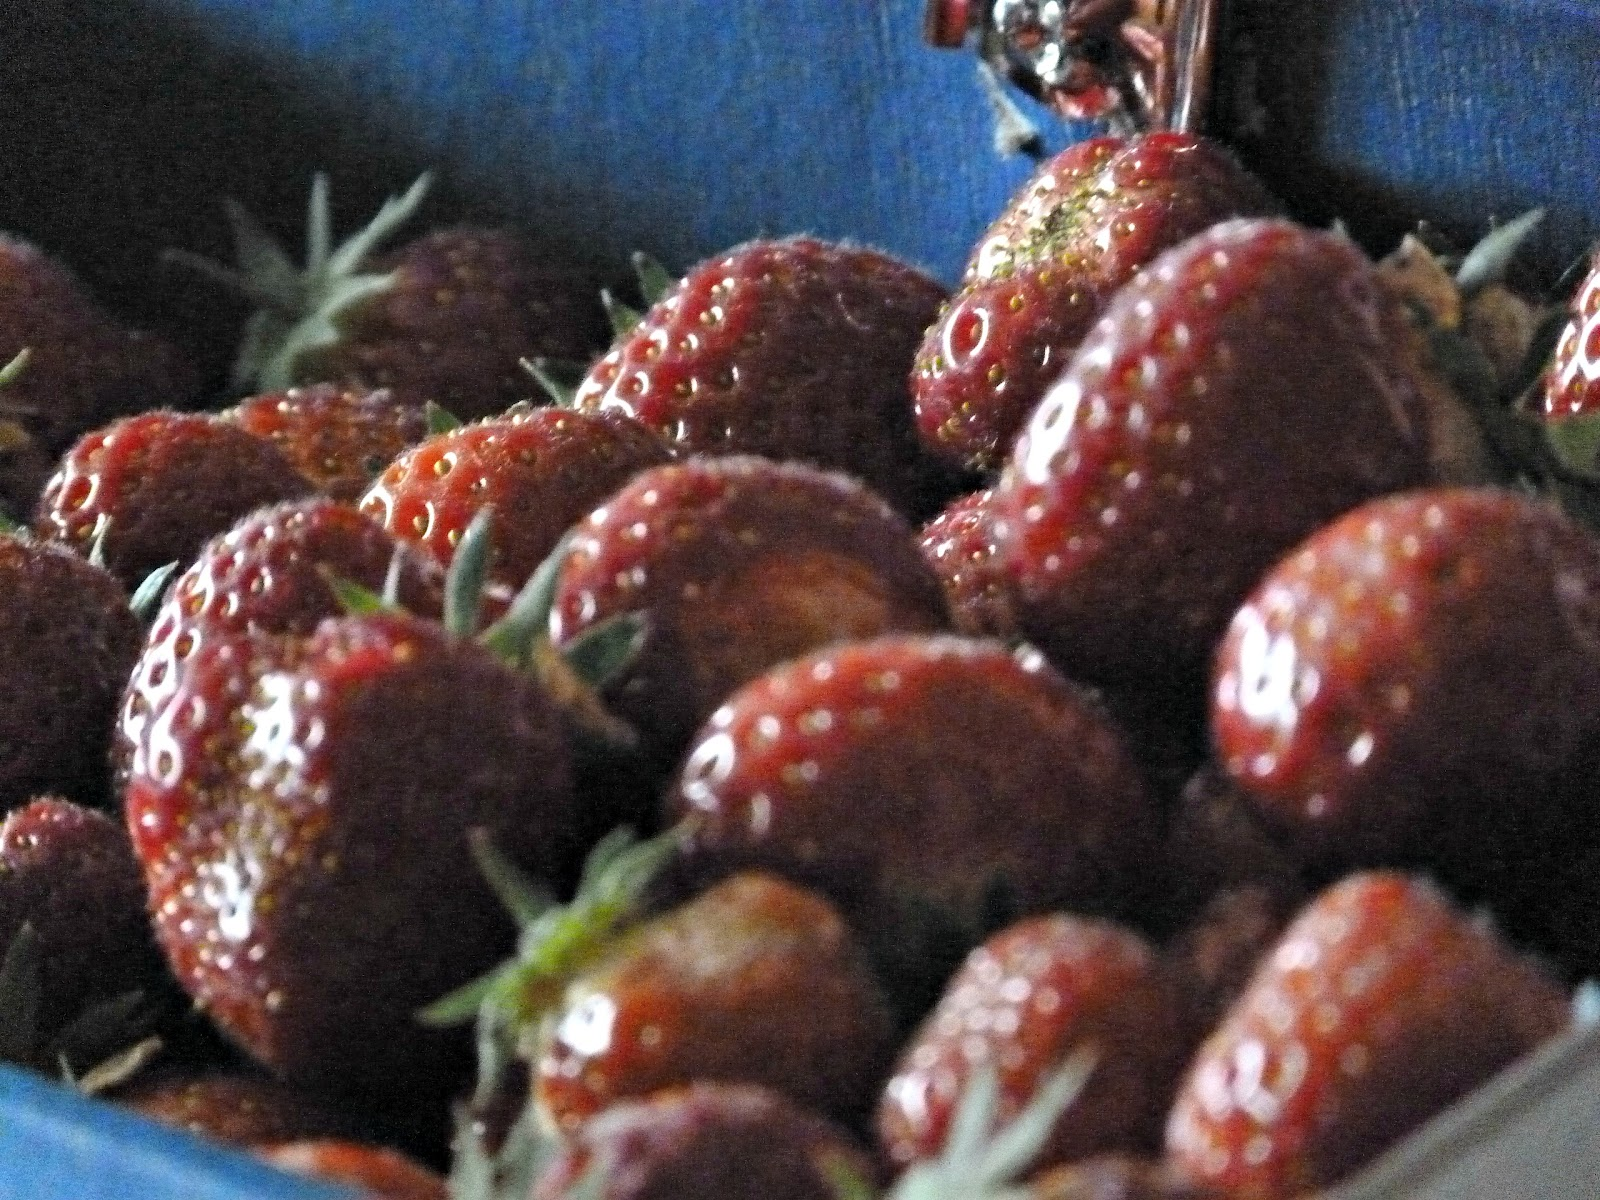 Strawberries - Scottish, tasty and healthy.